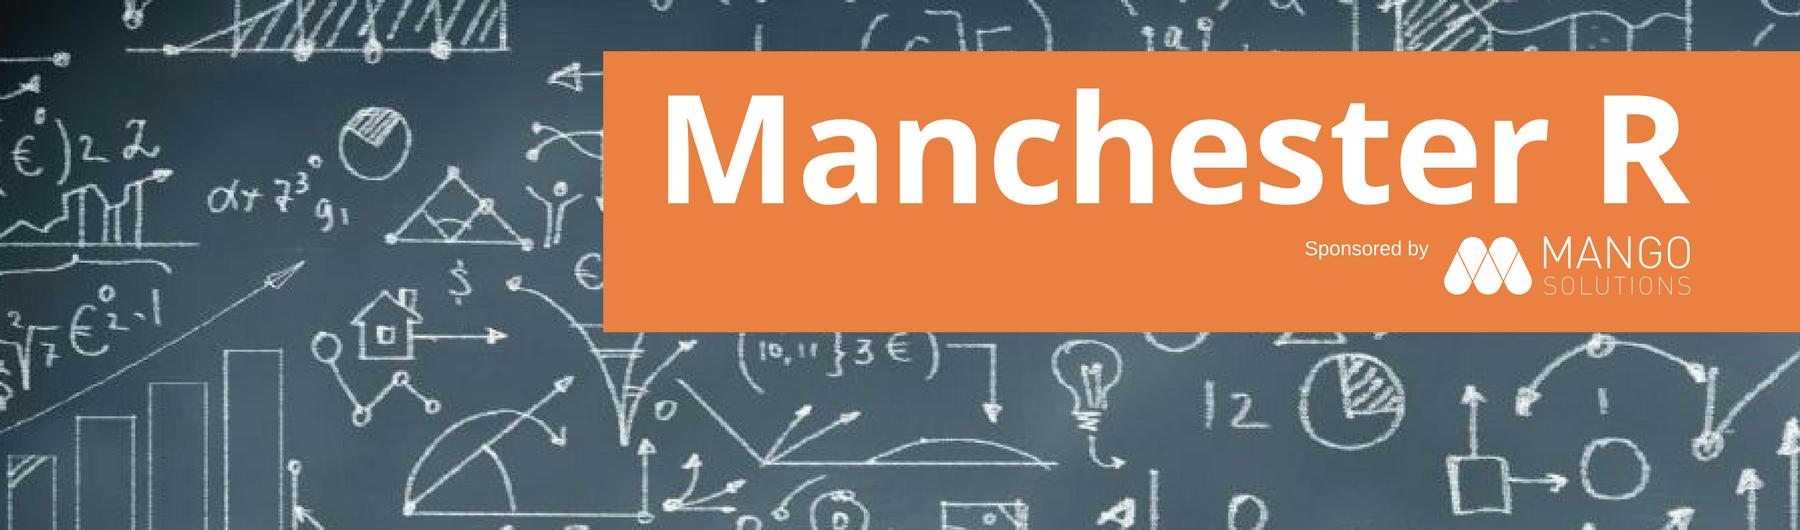 ManchesterR: 22 November 2018